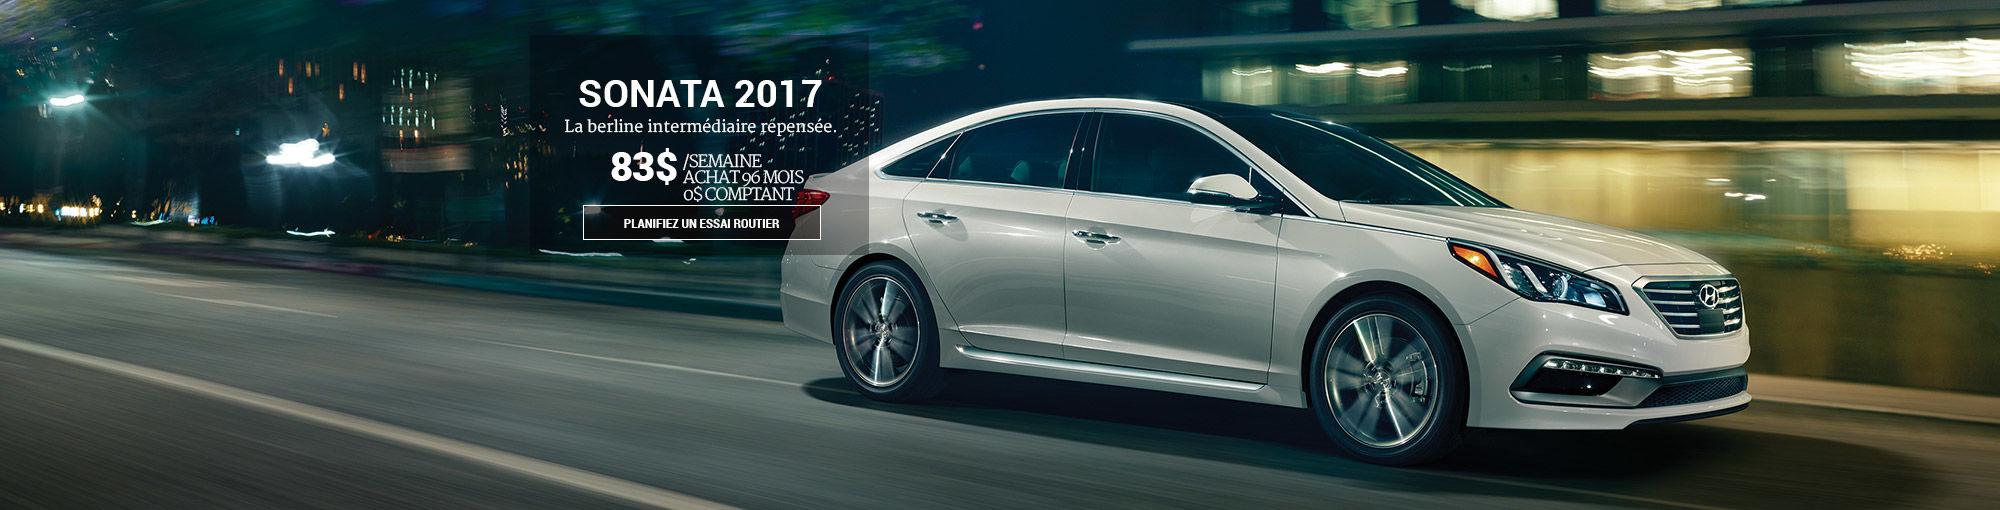 Sonata 2017 - janvier 2017 - HSH HTR